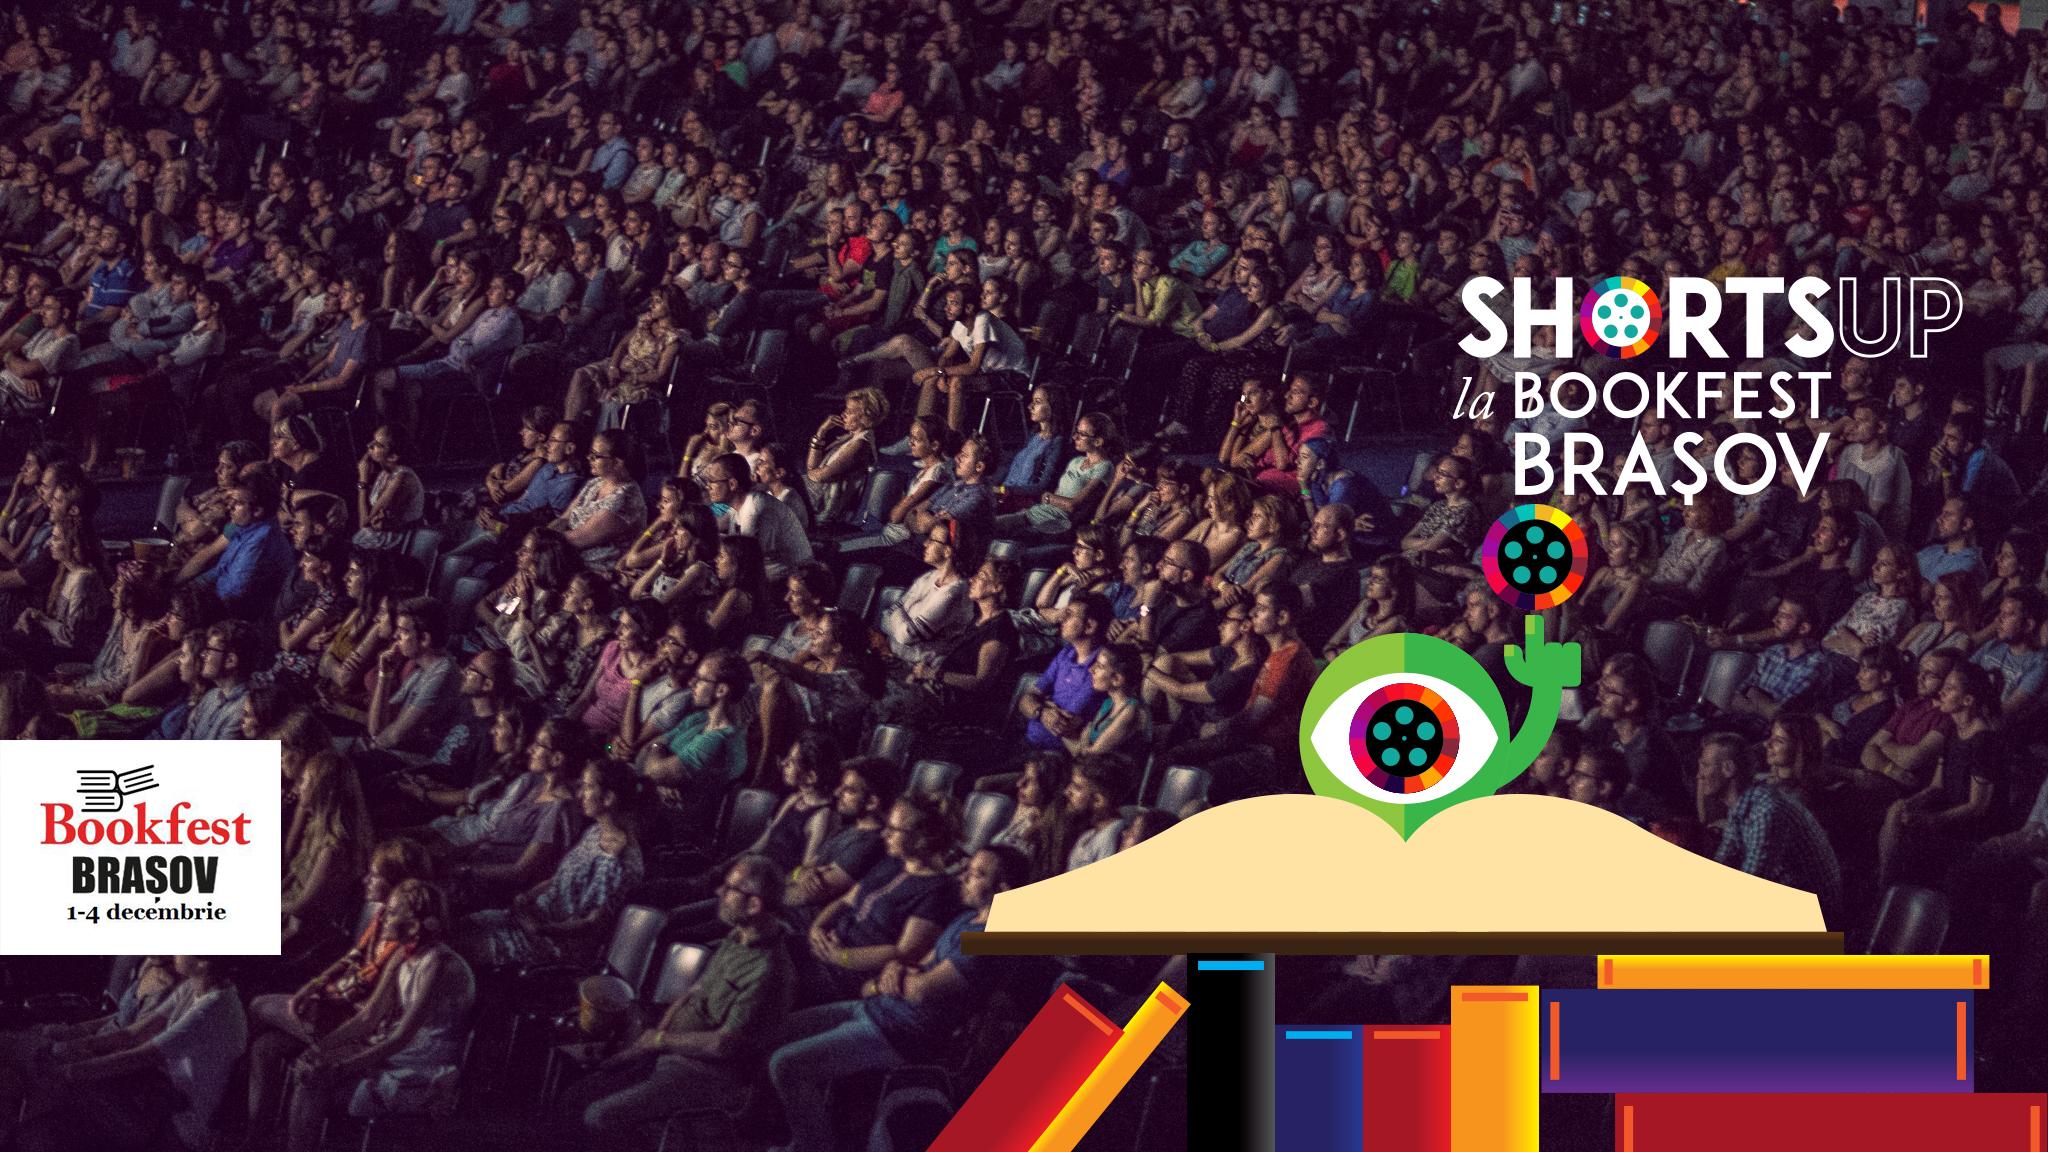 Shortsup bookfest brasov